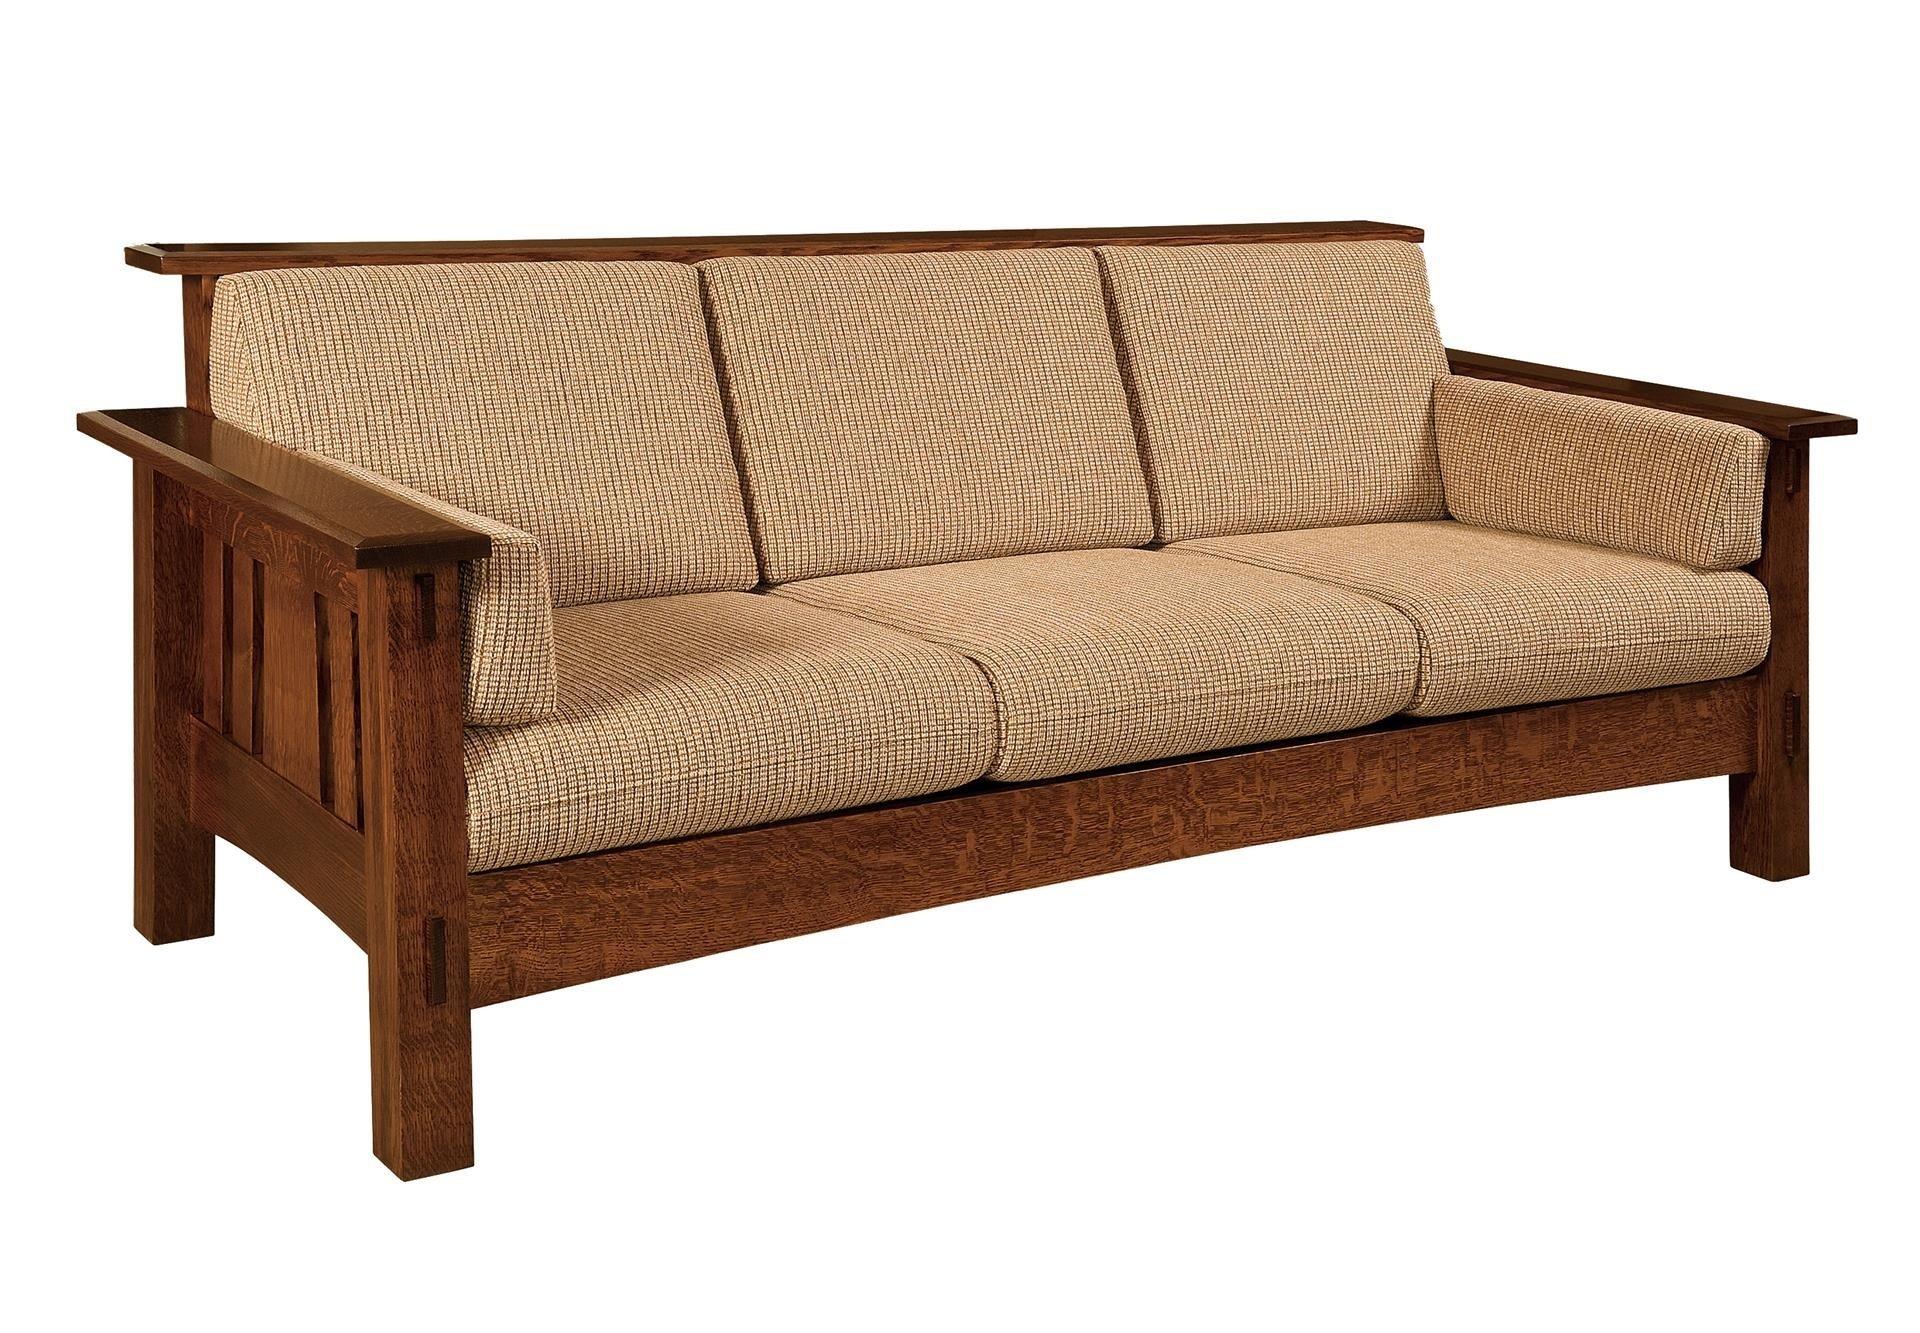 Solid wood Amish sofa